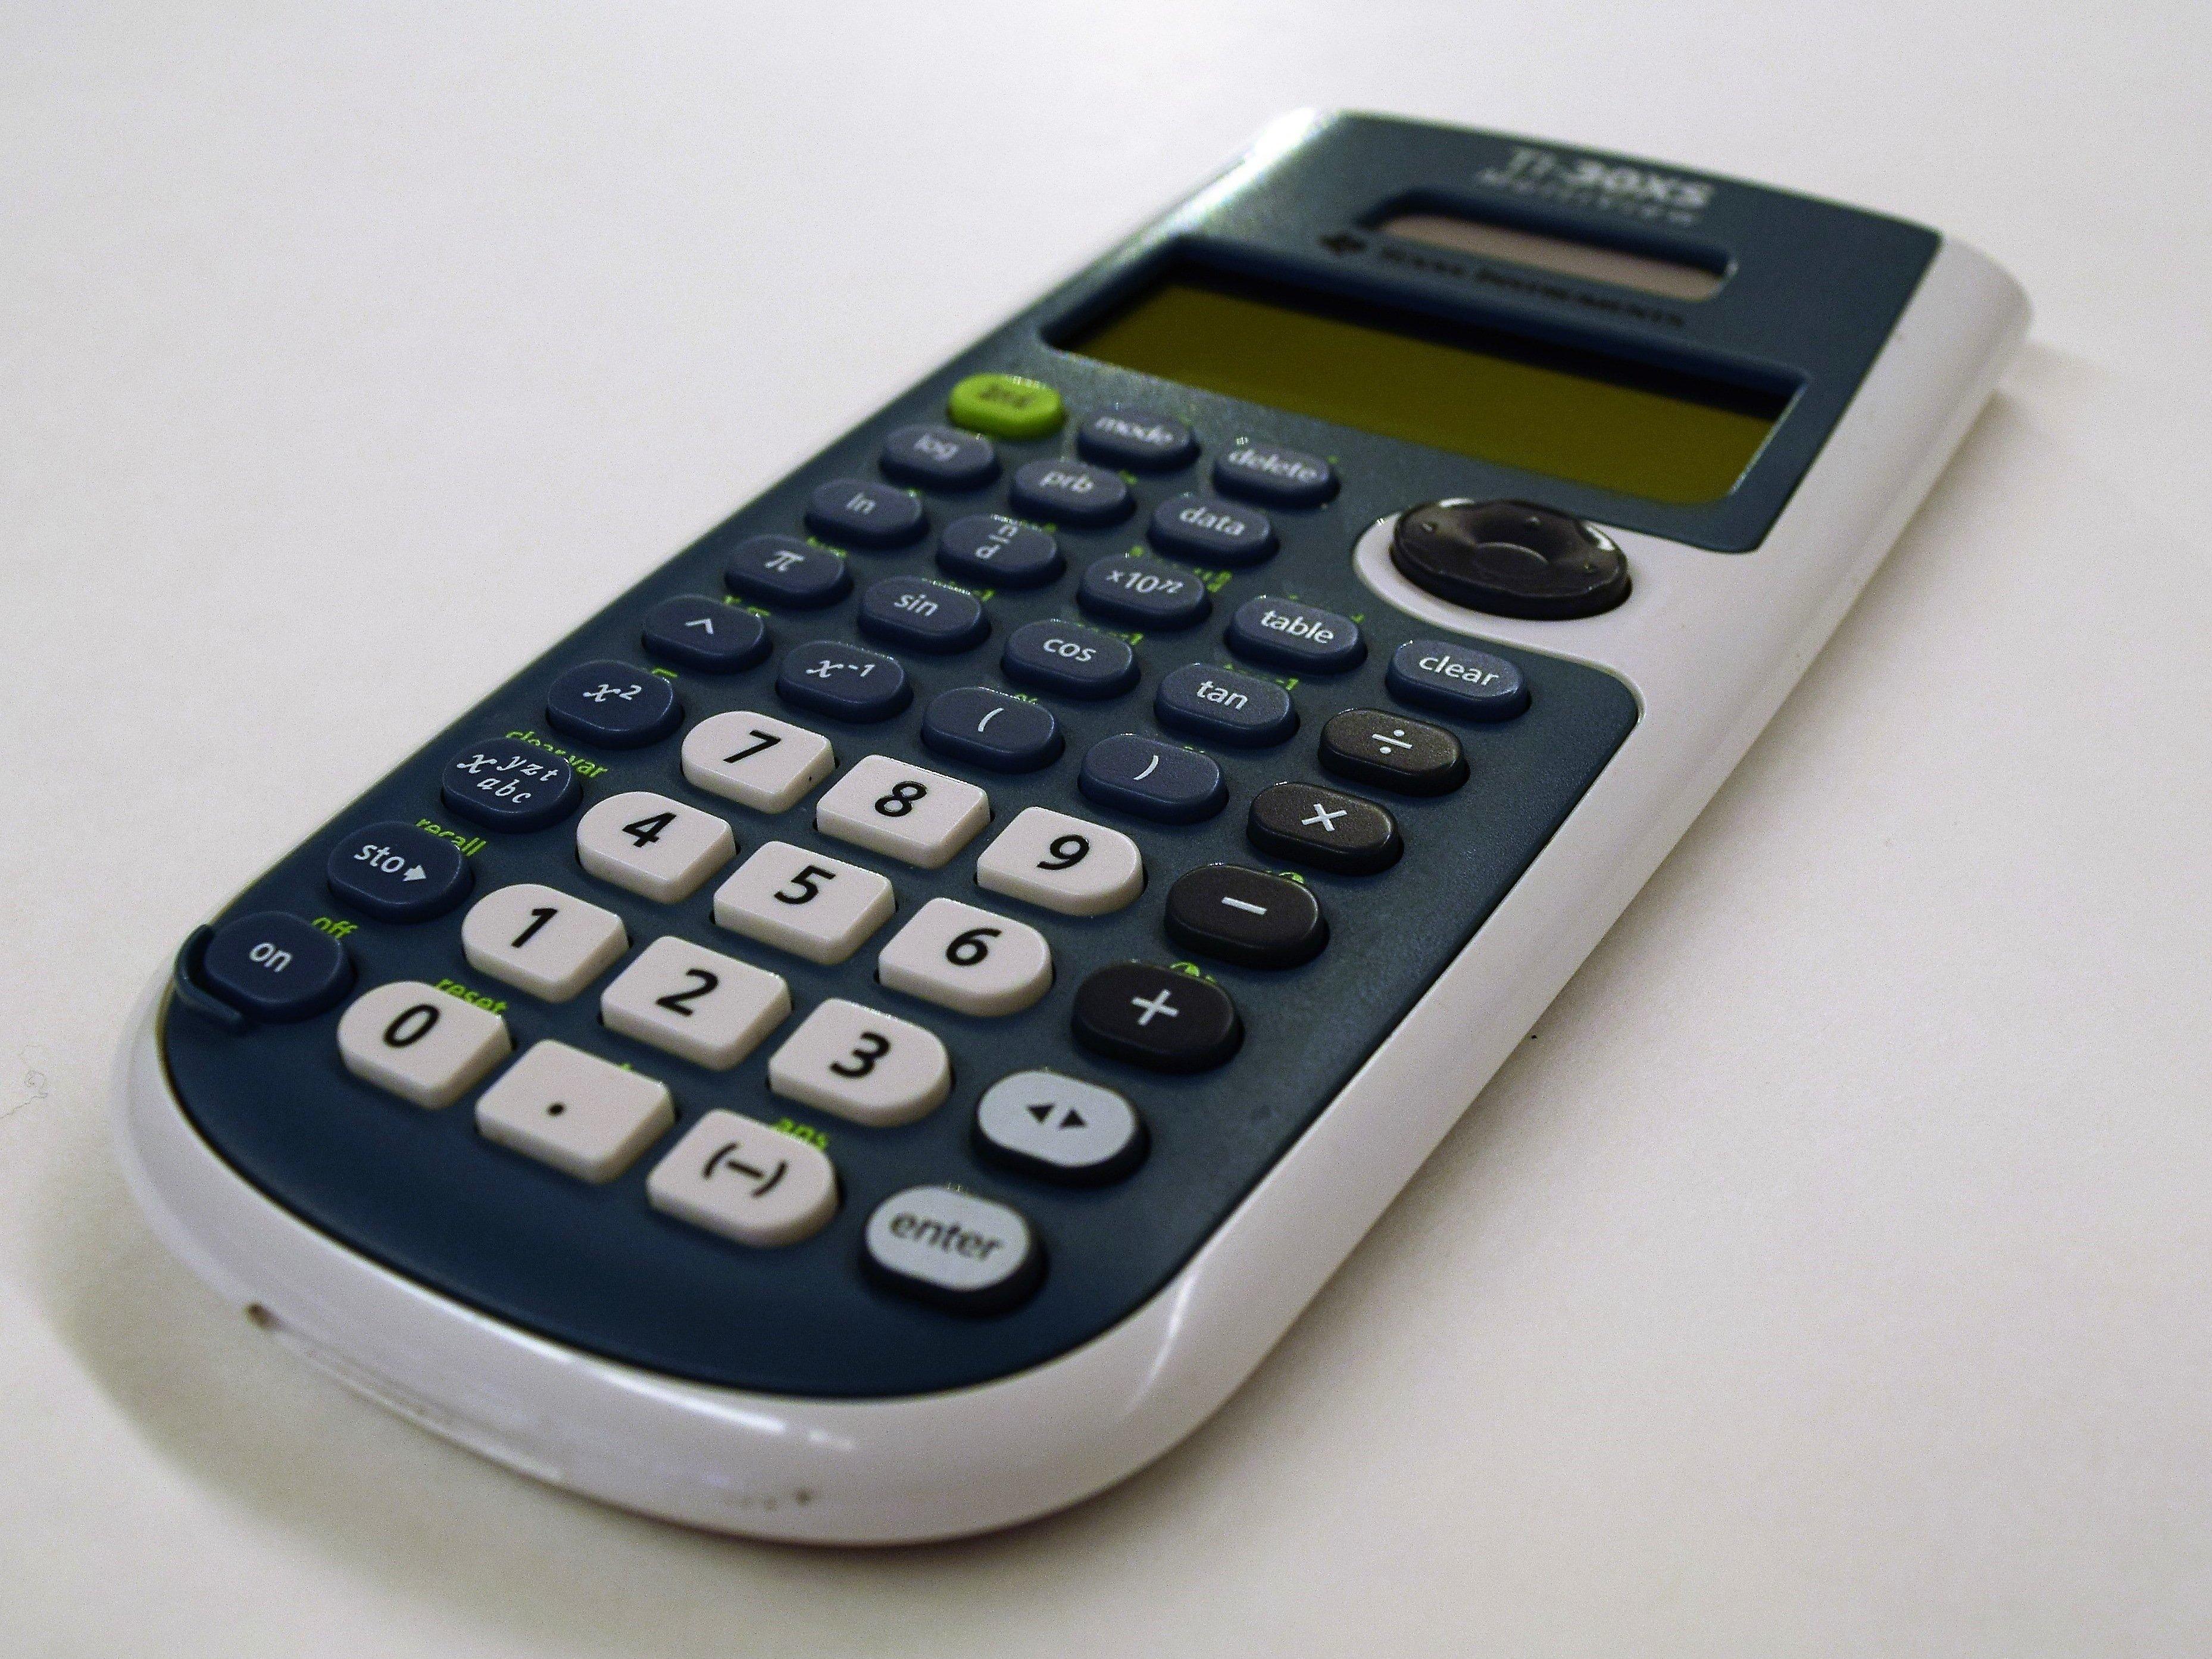 Texas Instruments TI-30 XS Multiview Teardown - iFixit